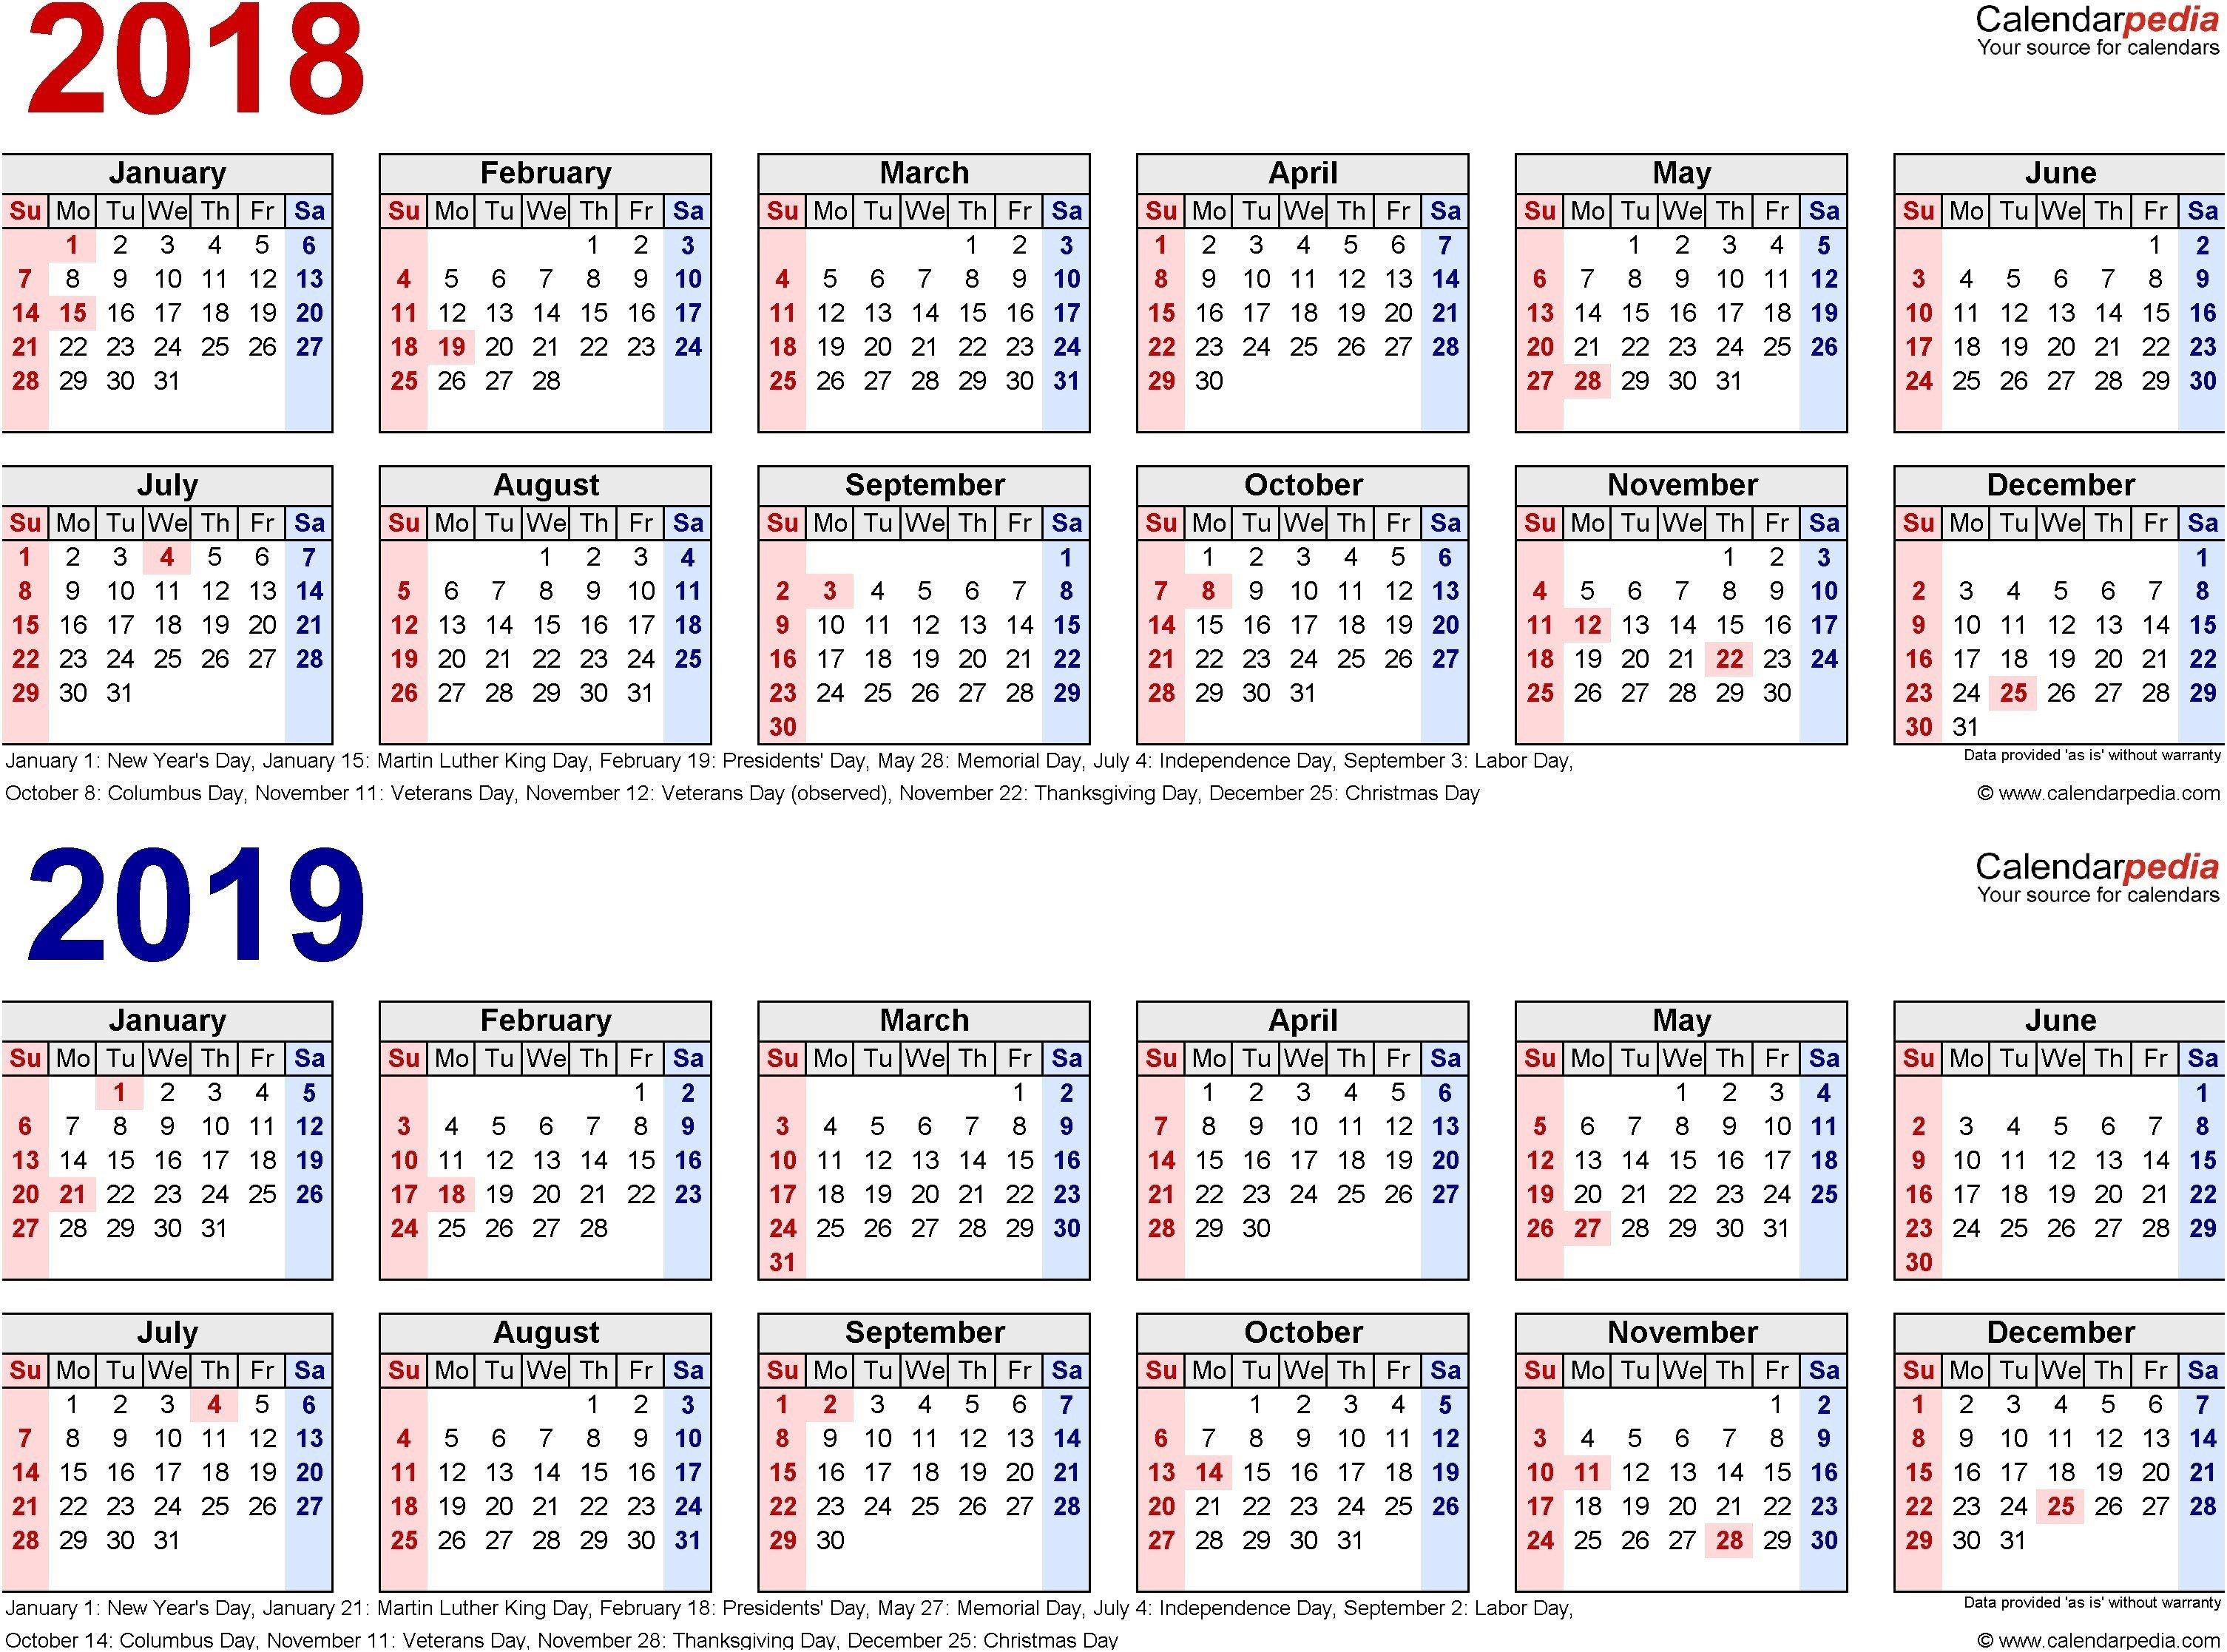 2019 Calendar 20 13 Period Calendar – Calendar 2019 Calendar 4 4 5